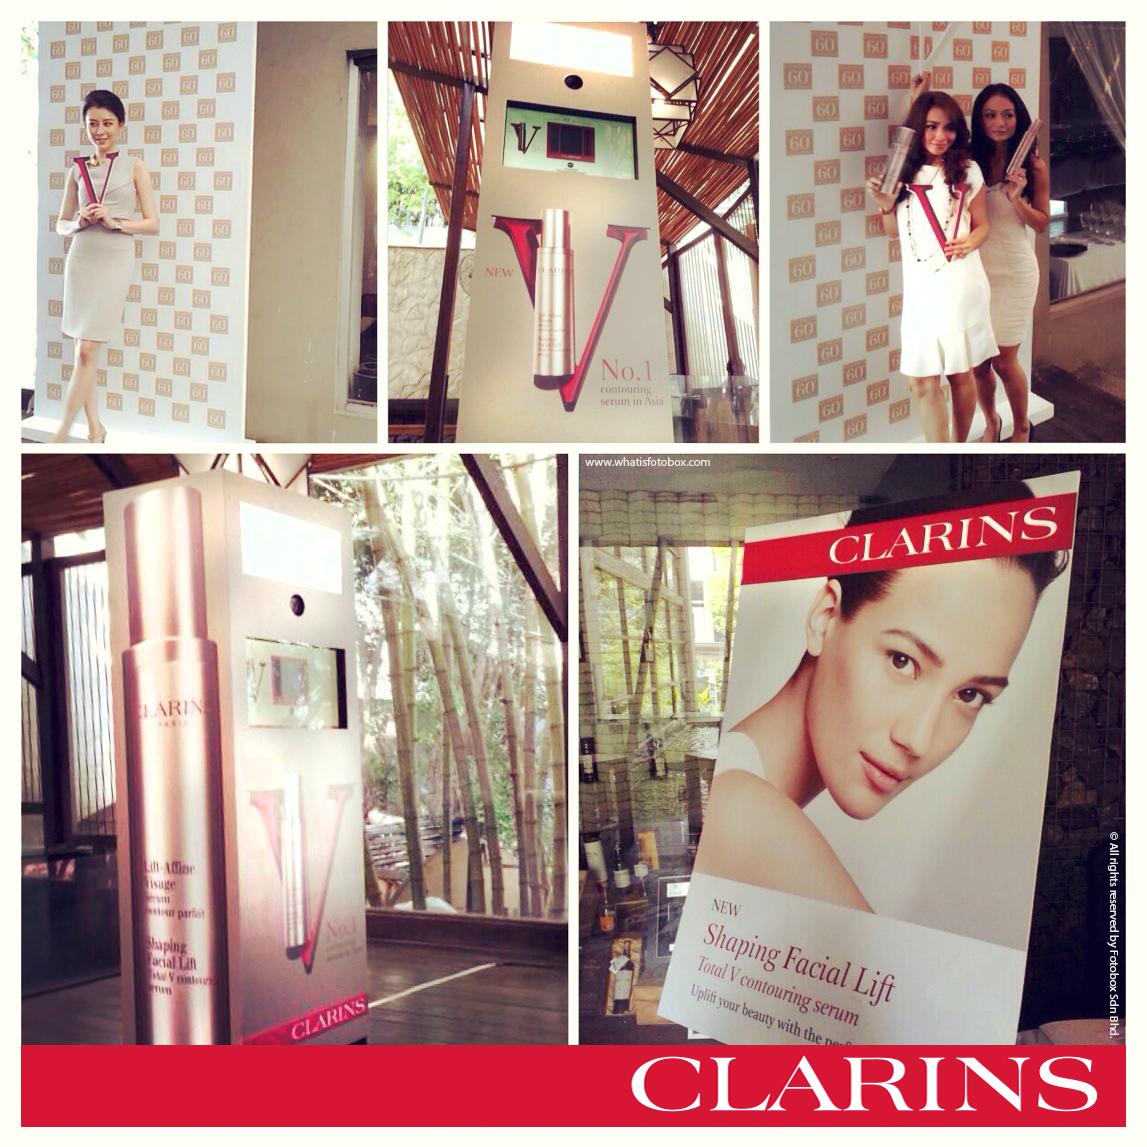 Fotobox Clarins.jpg